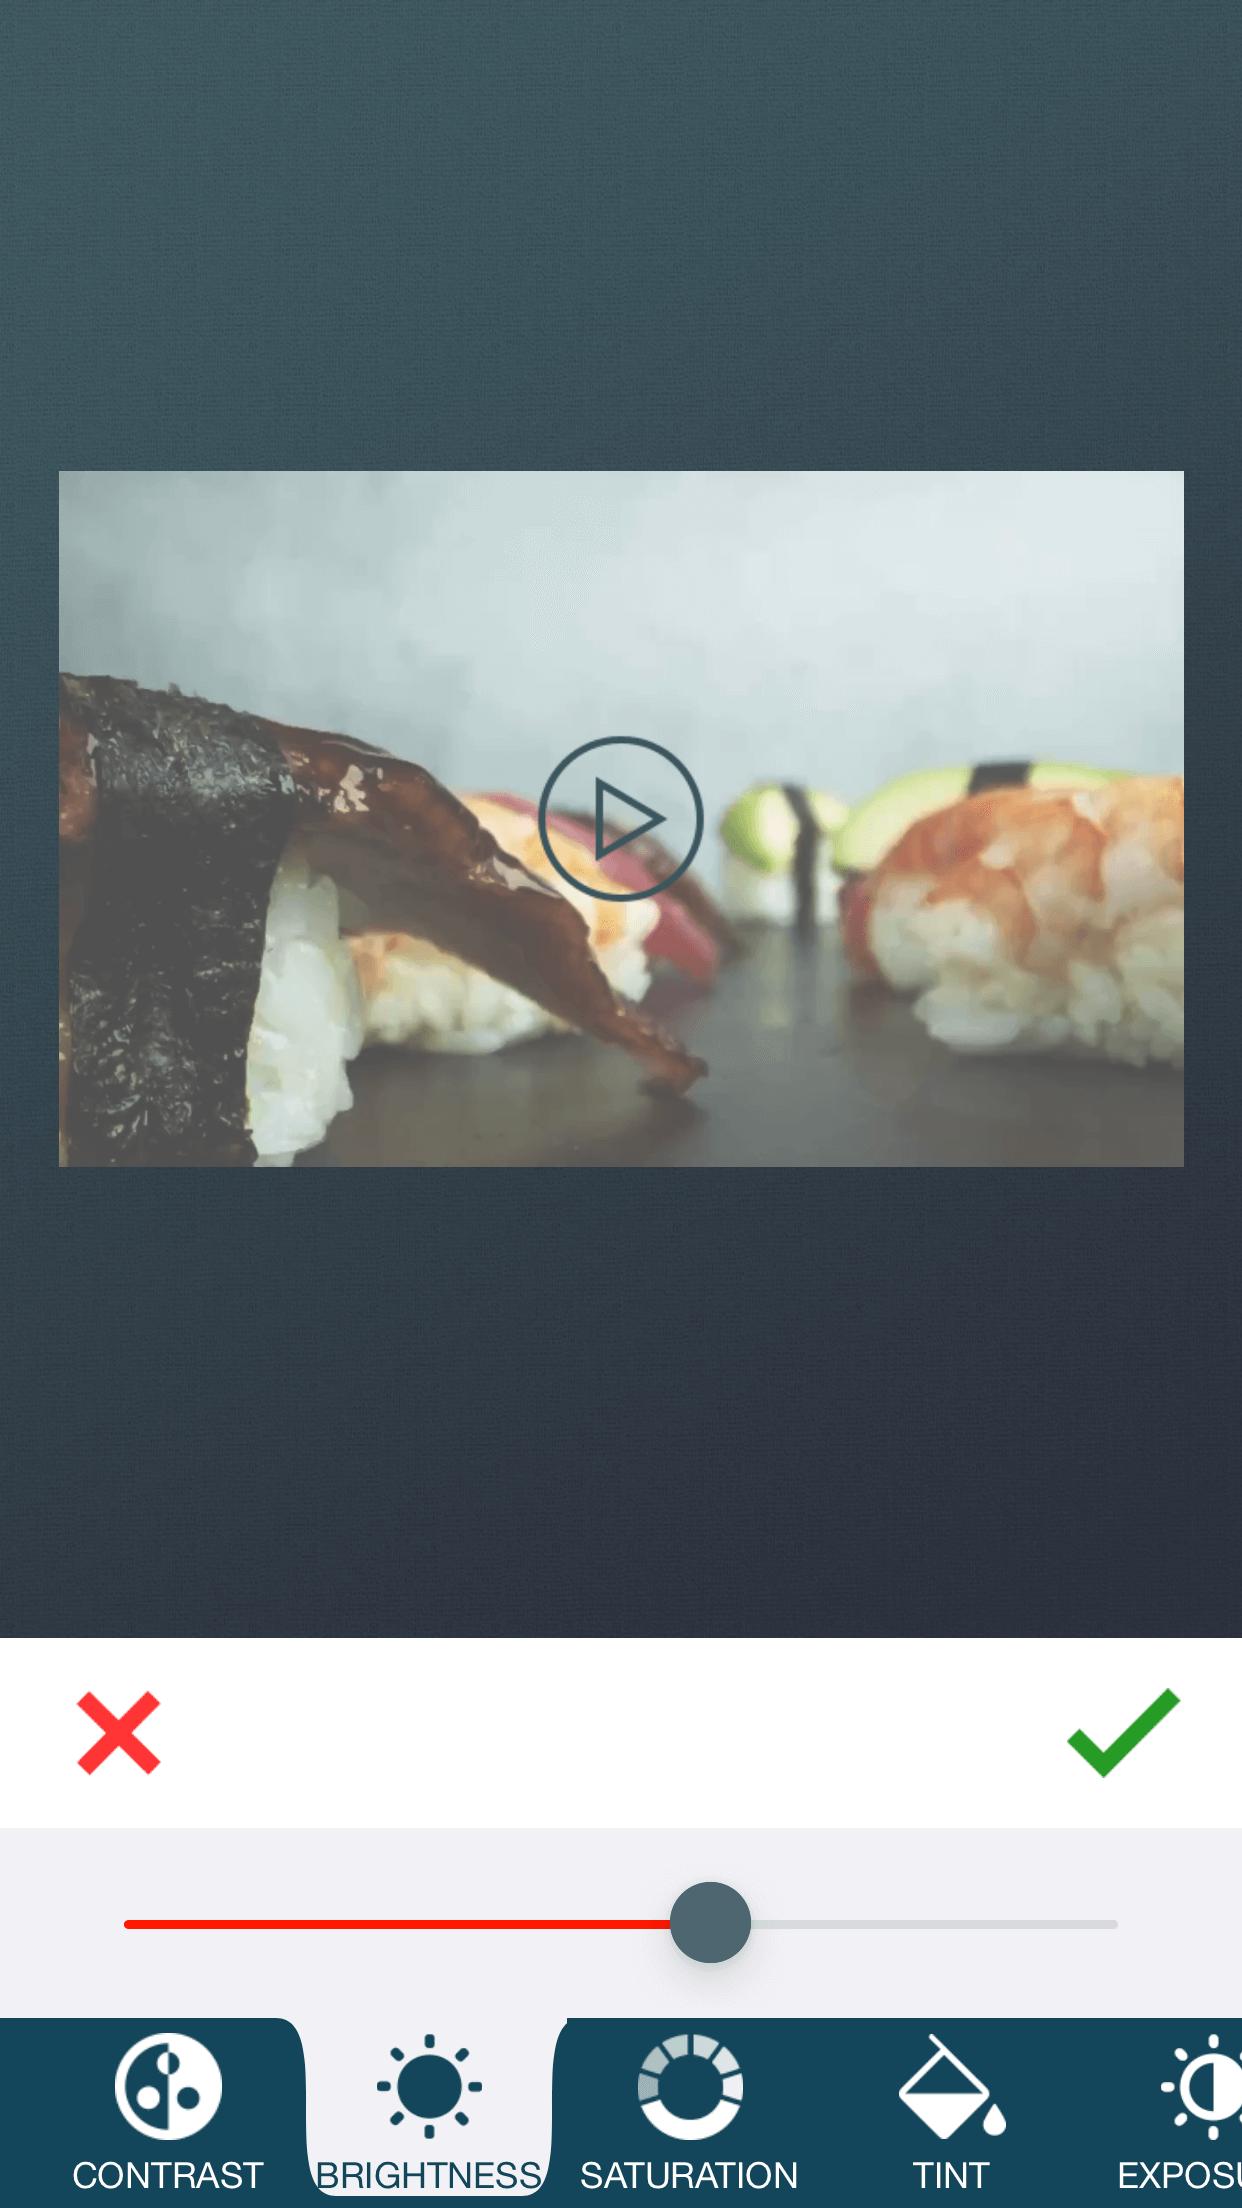 Adjust Brightness of video with zShot app.